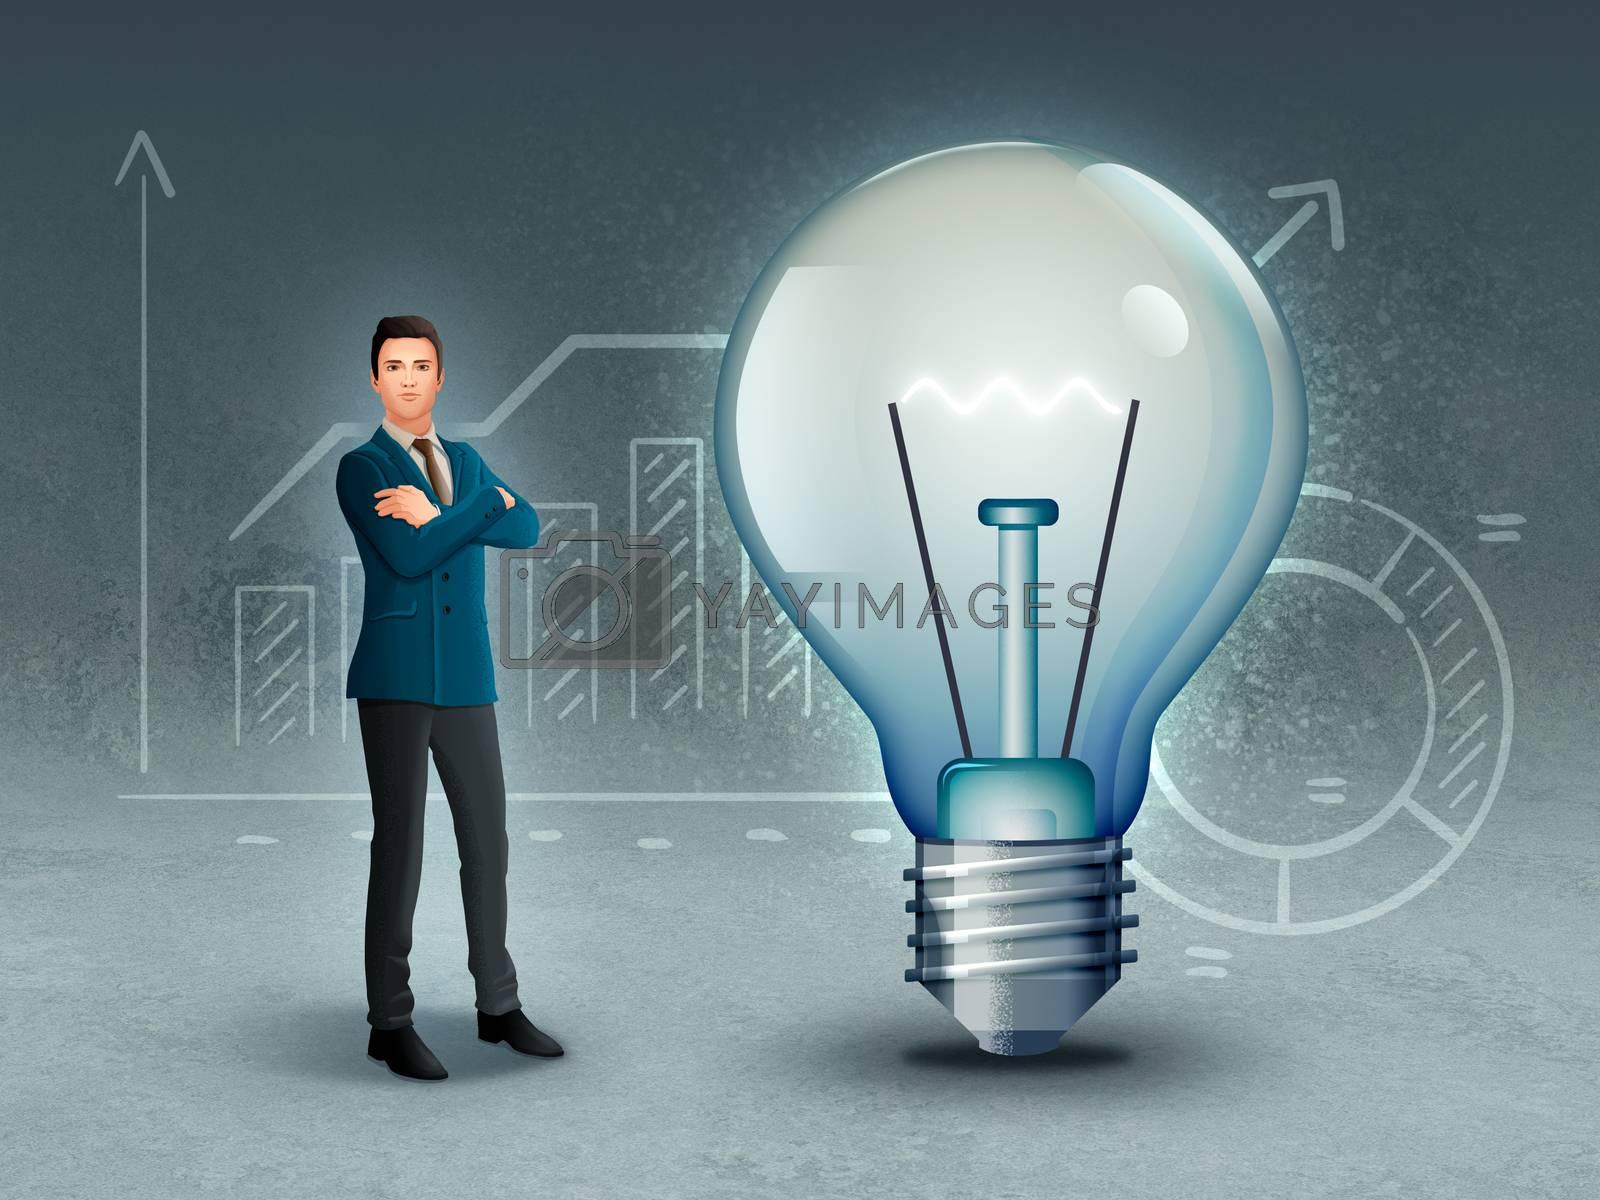 Businessman and lightbulb over some financial results graphs. Digital illustration.